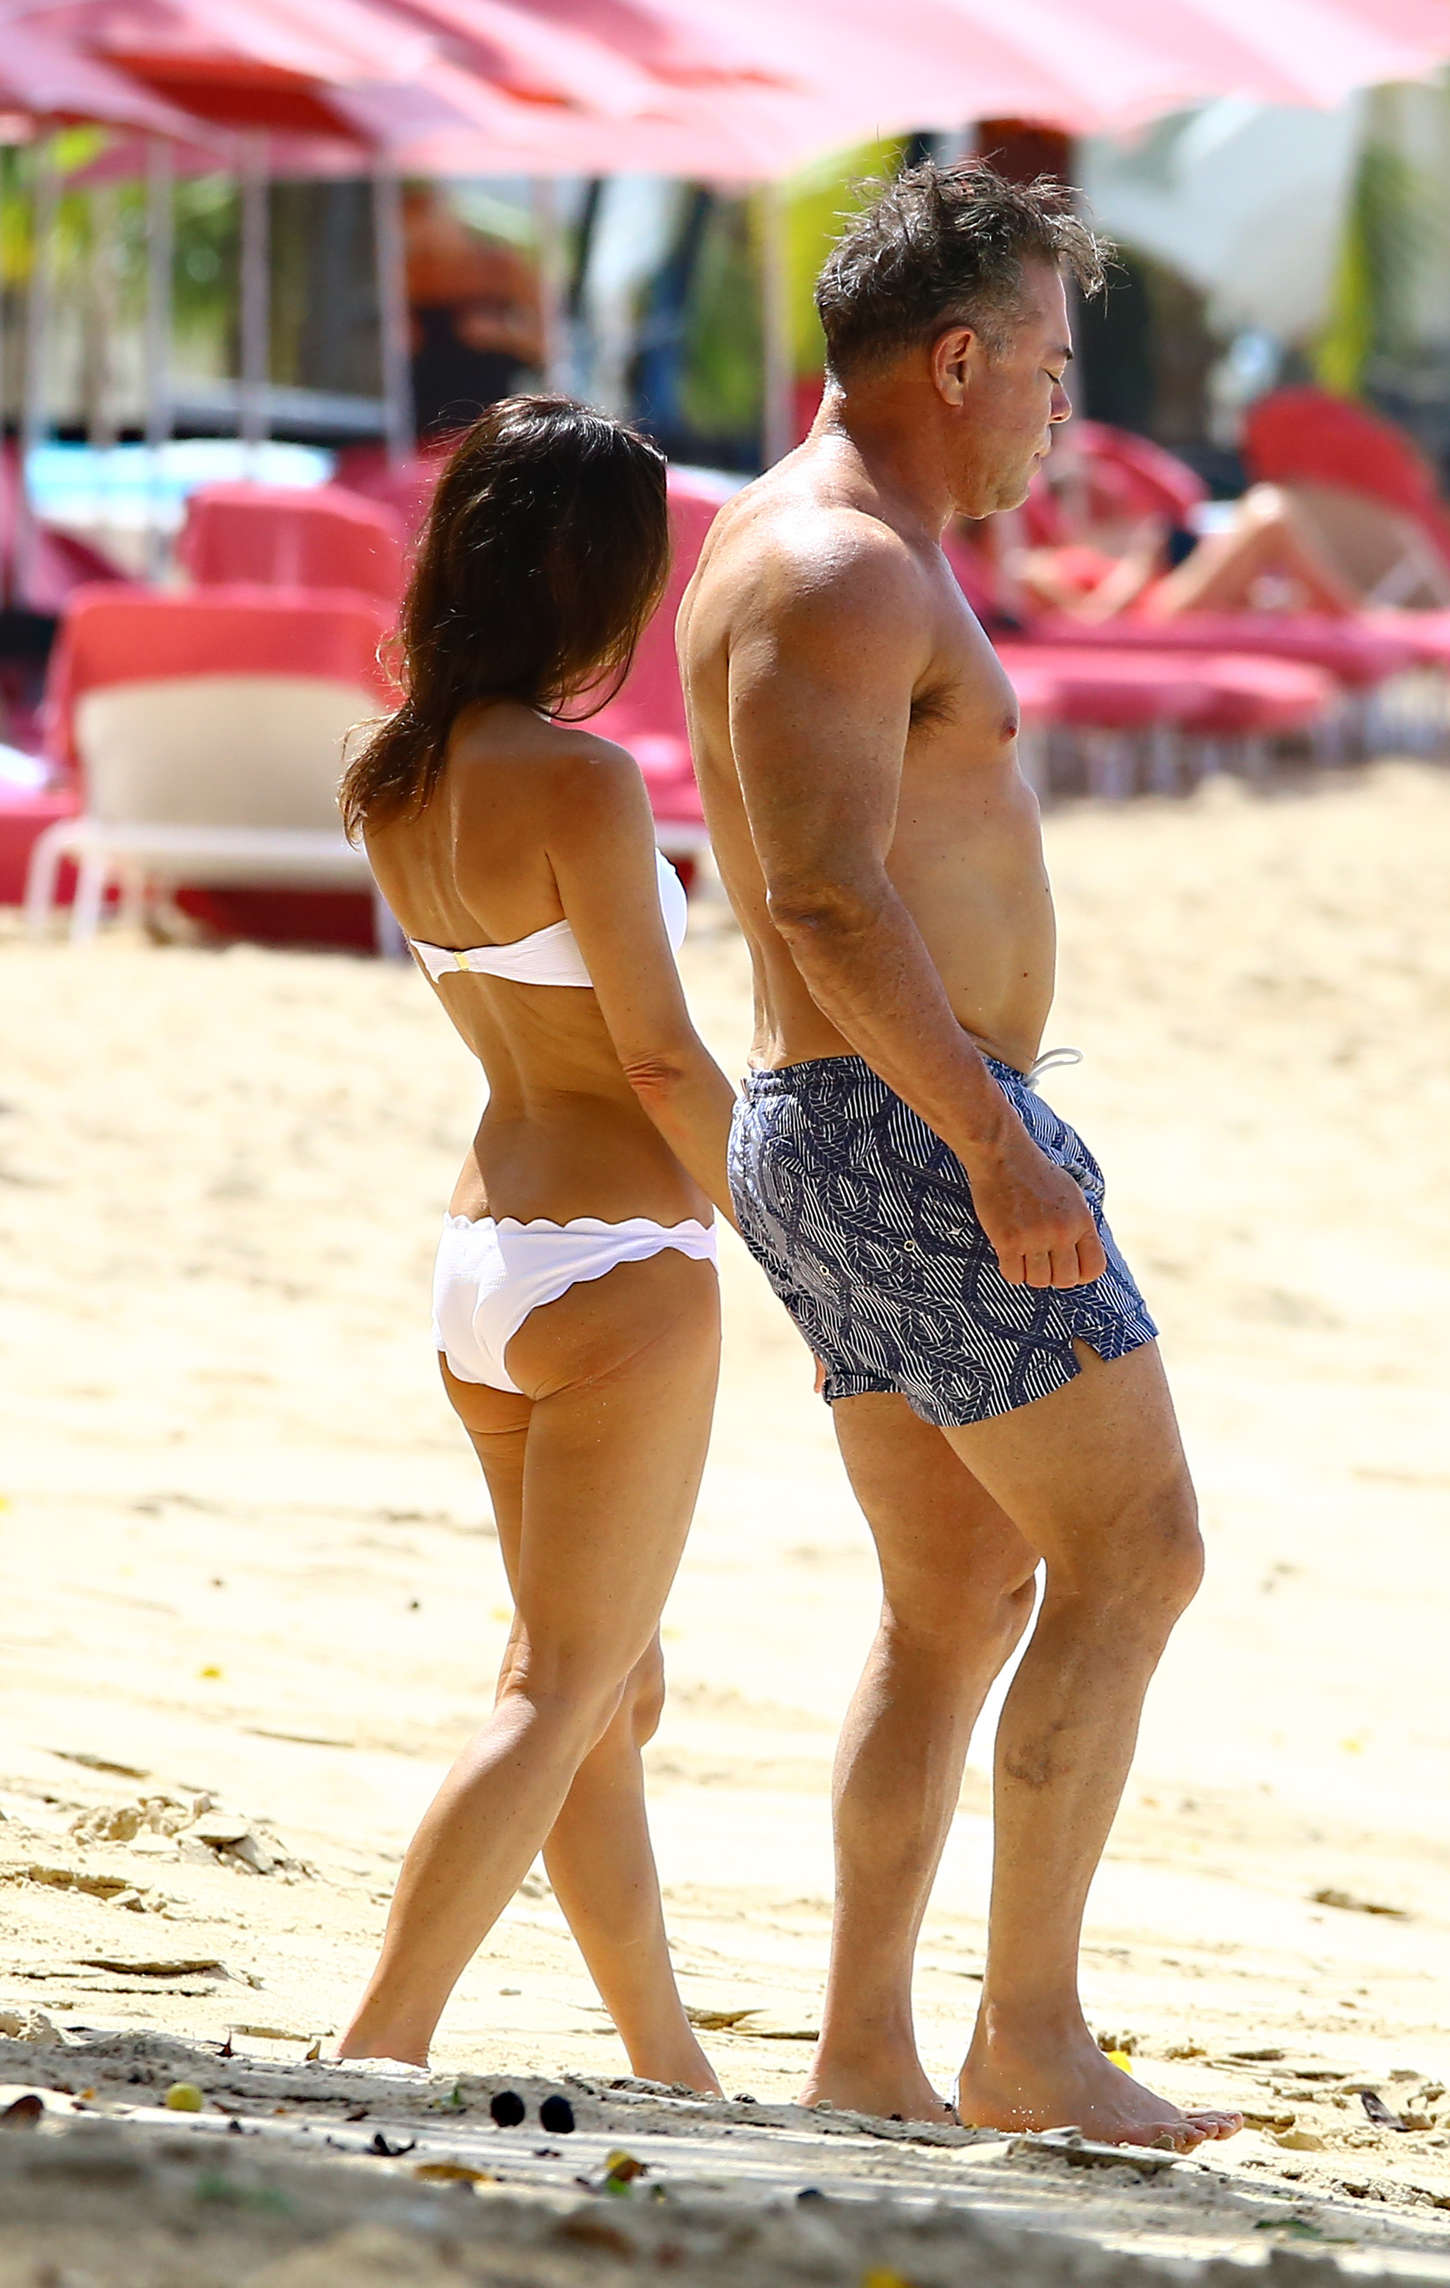 Gabrielle fitzpatrick nice guy bikini — pic 8